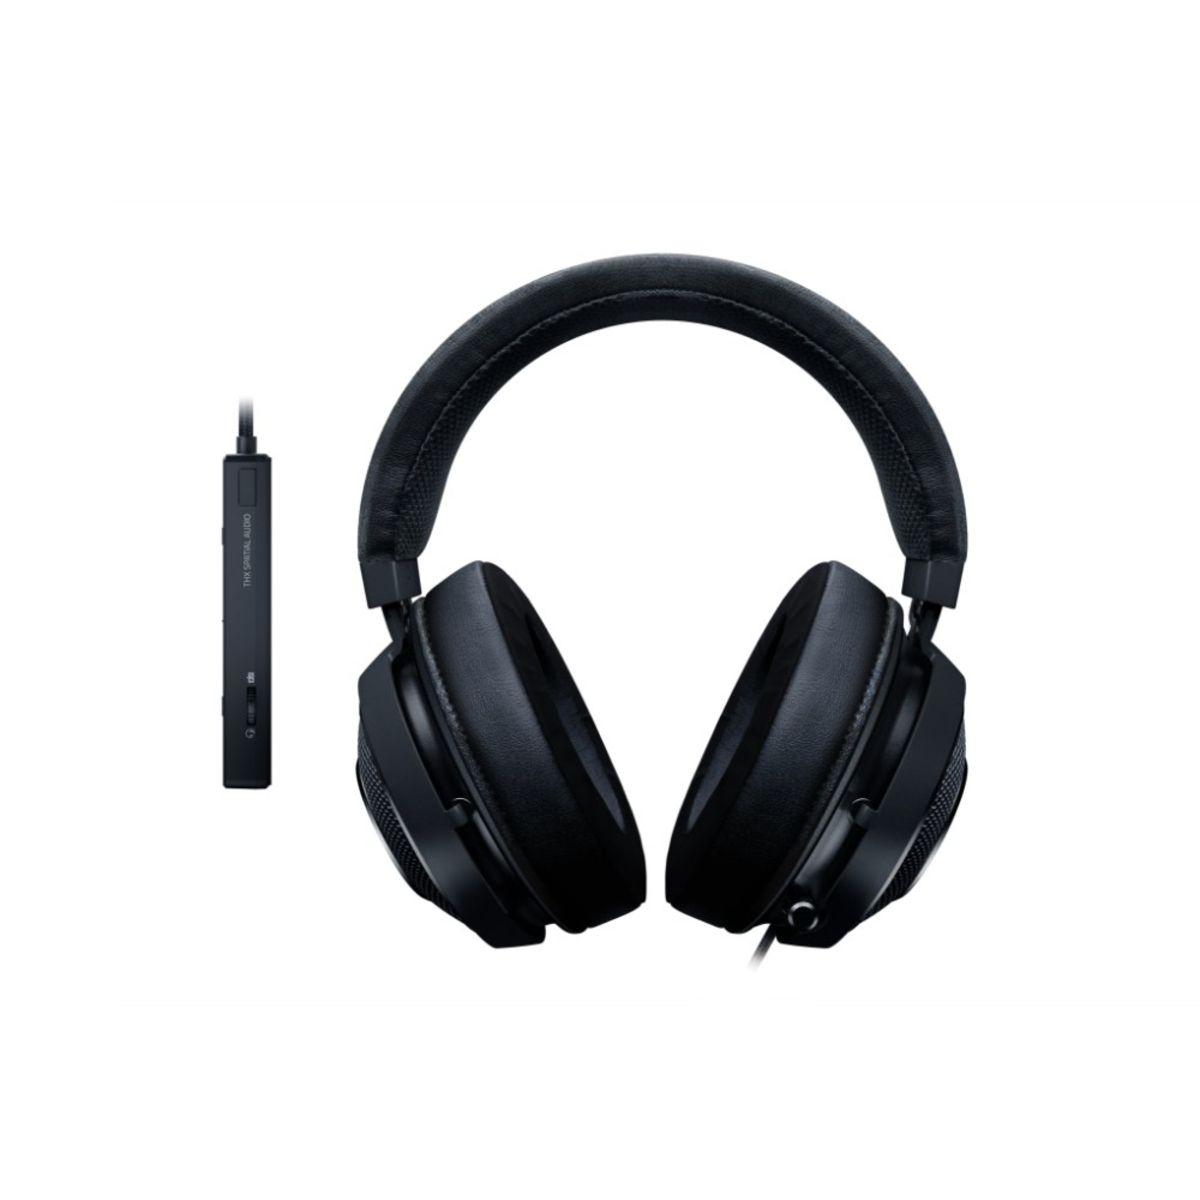 Casque audio - Kraken Tournament Edition Black - Noir